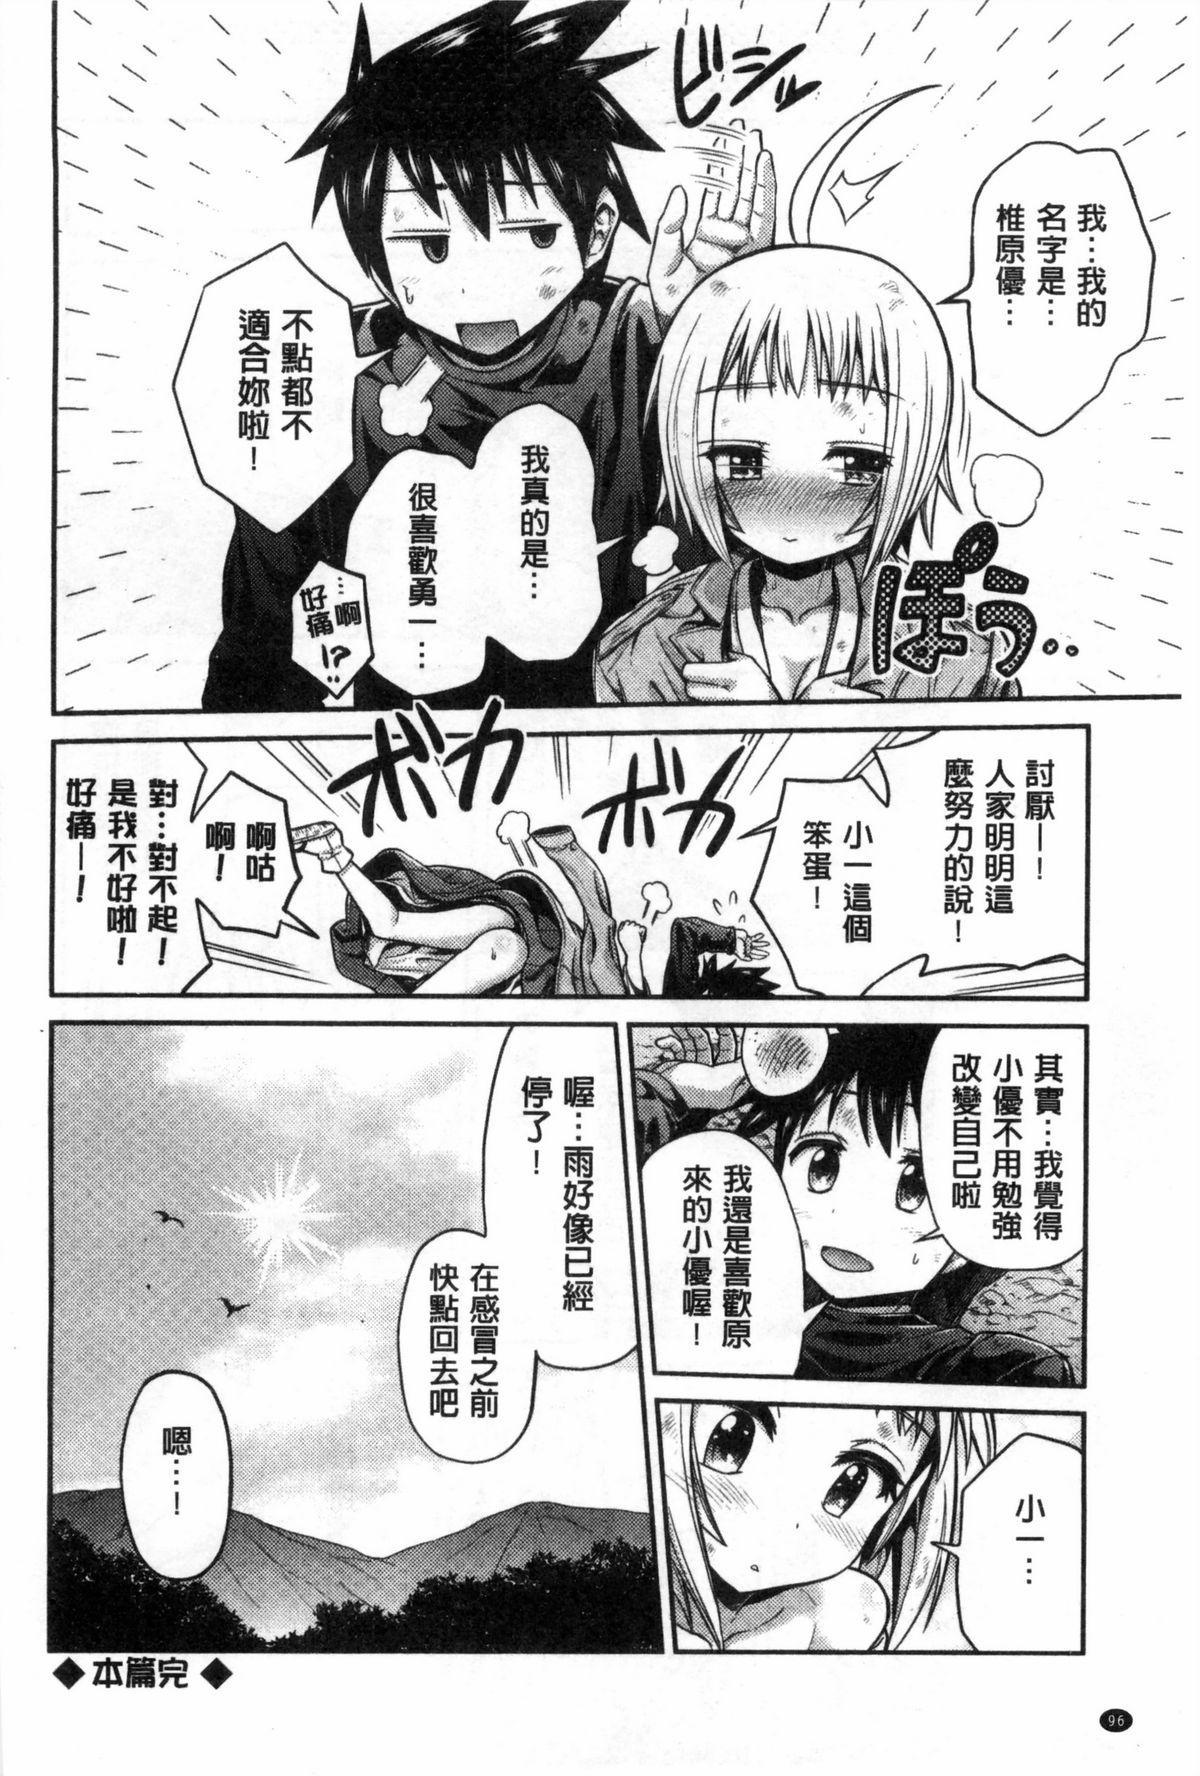 Man x Koi - Ero Manga de Hajimaru Koi no Plot   A漫×戀情 由情色漫畫所萌生的戀之物語 96